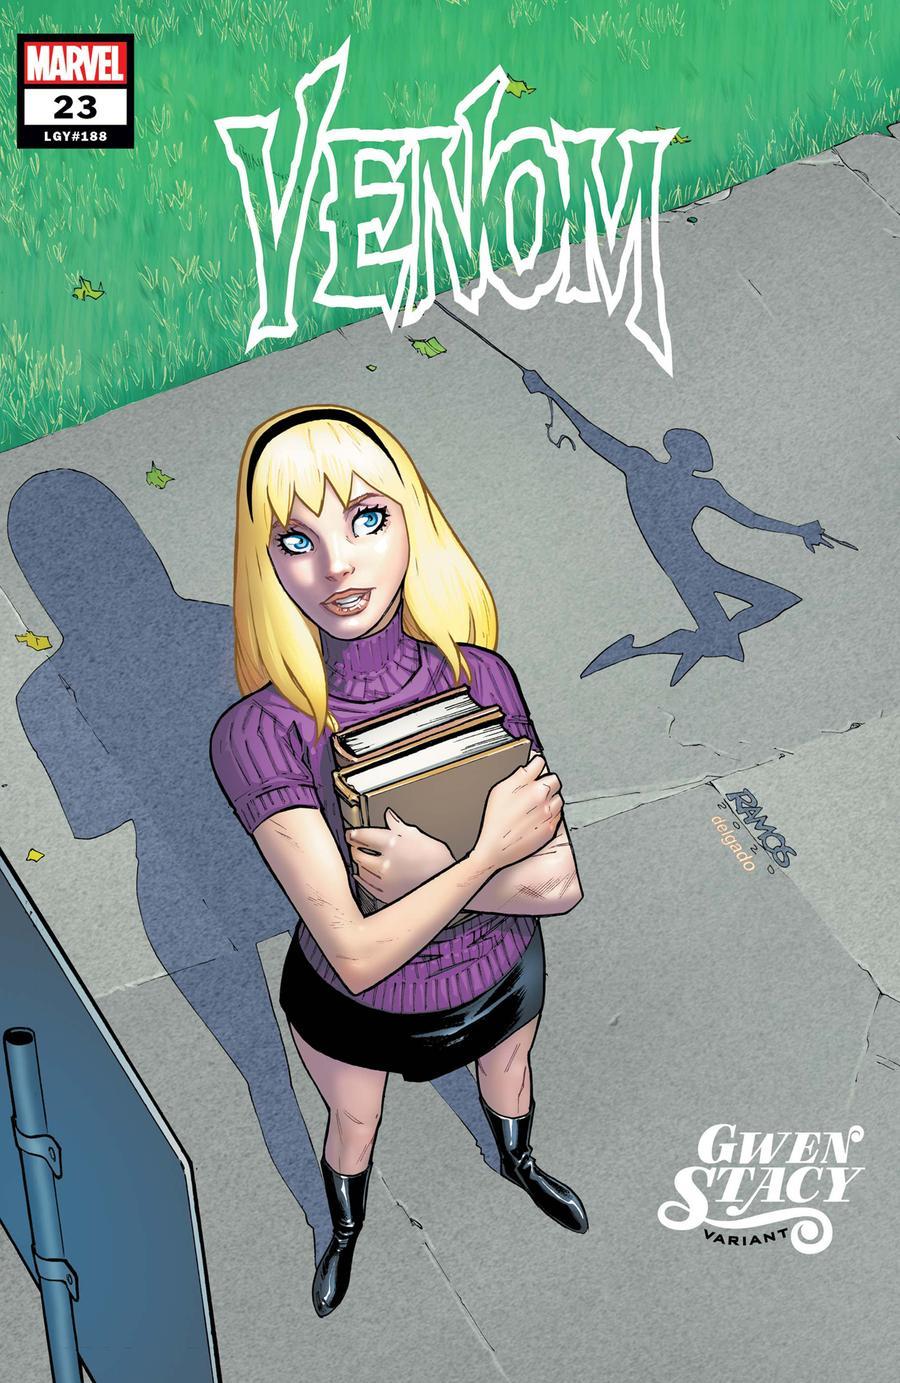 Venom Vol 4 #23 Cover B Variant Humberto Ramos Gwen Stacy Cover